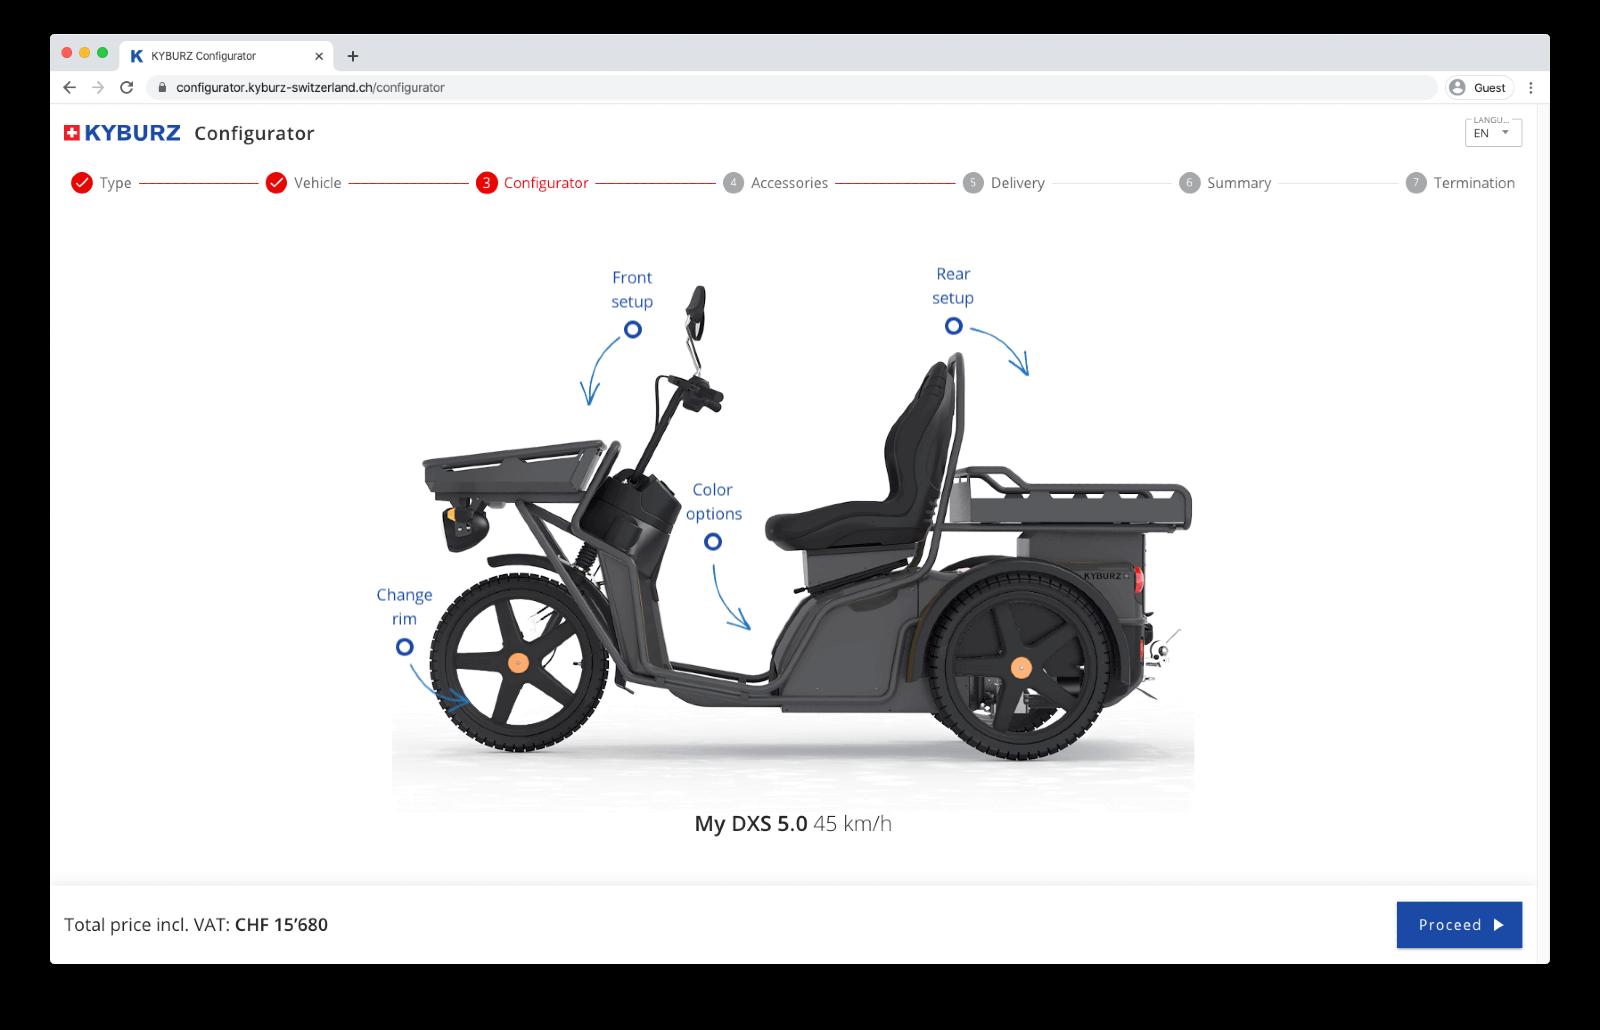 Produktkonfigurator für KYBURZ